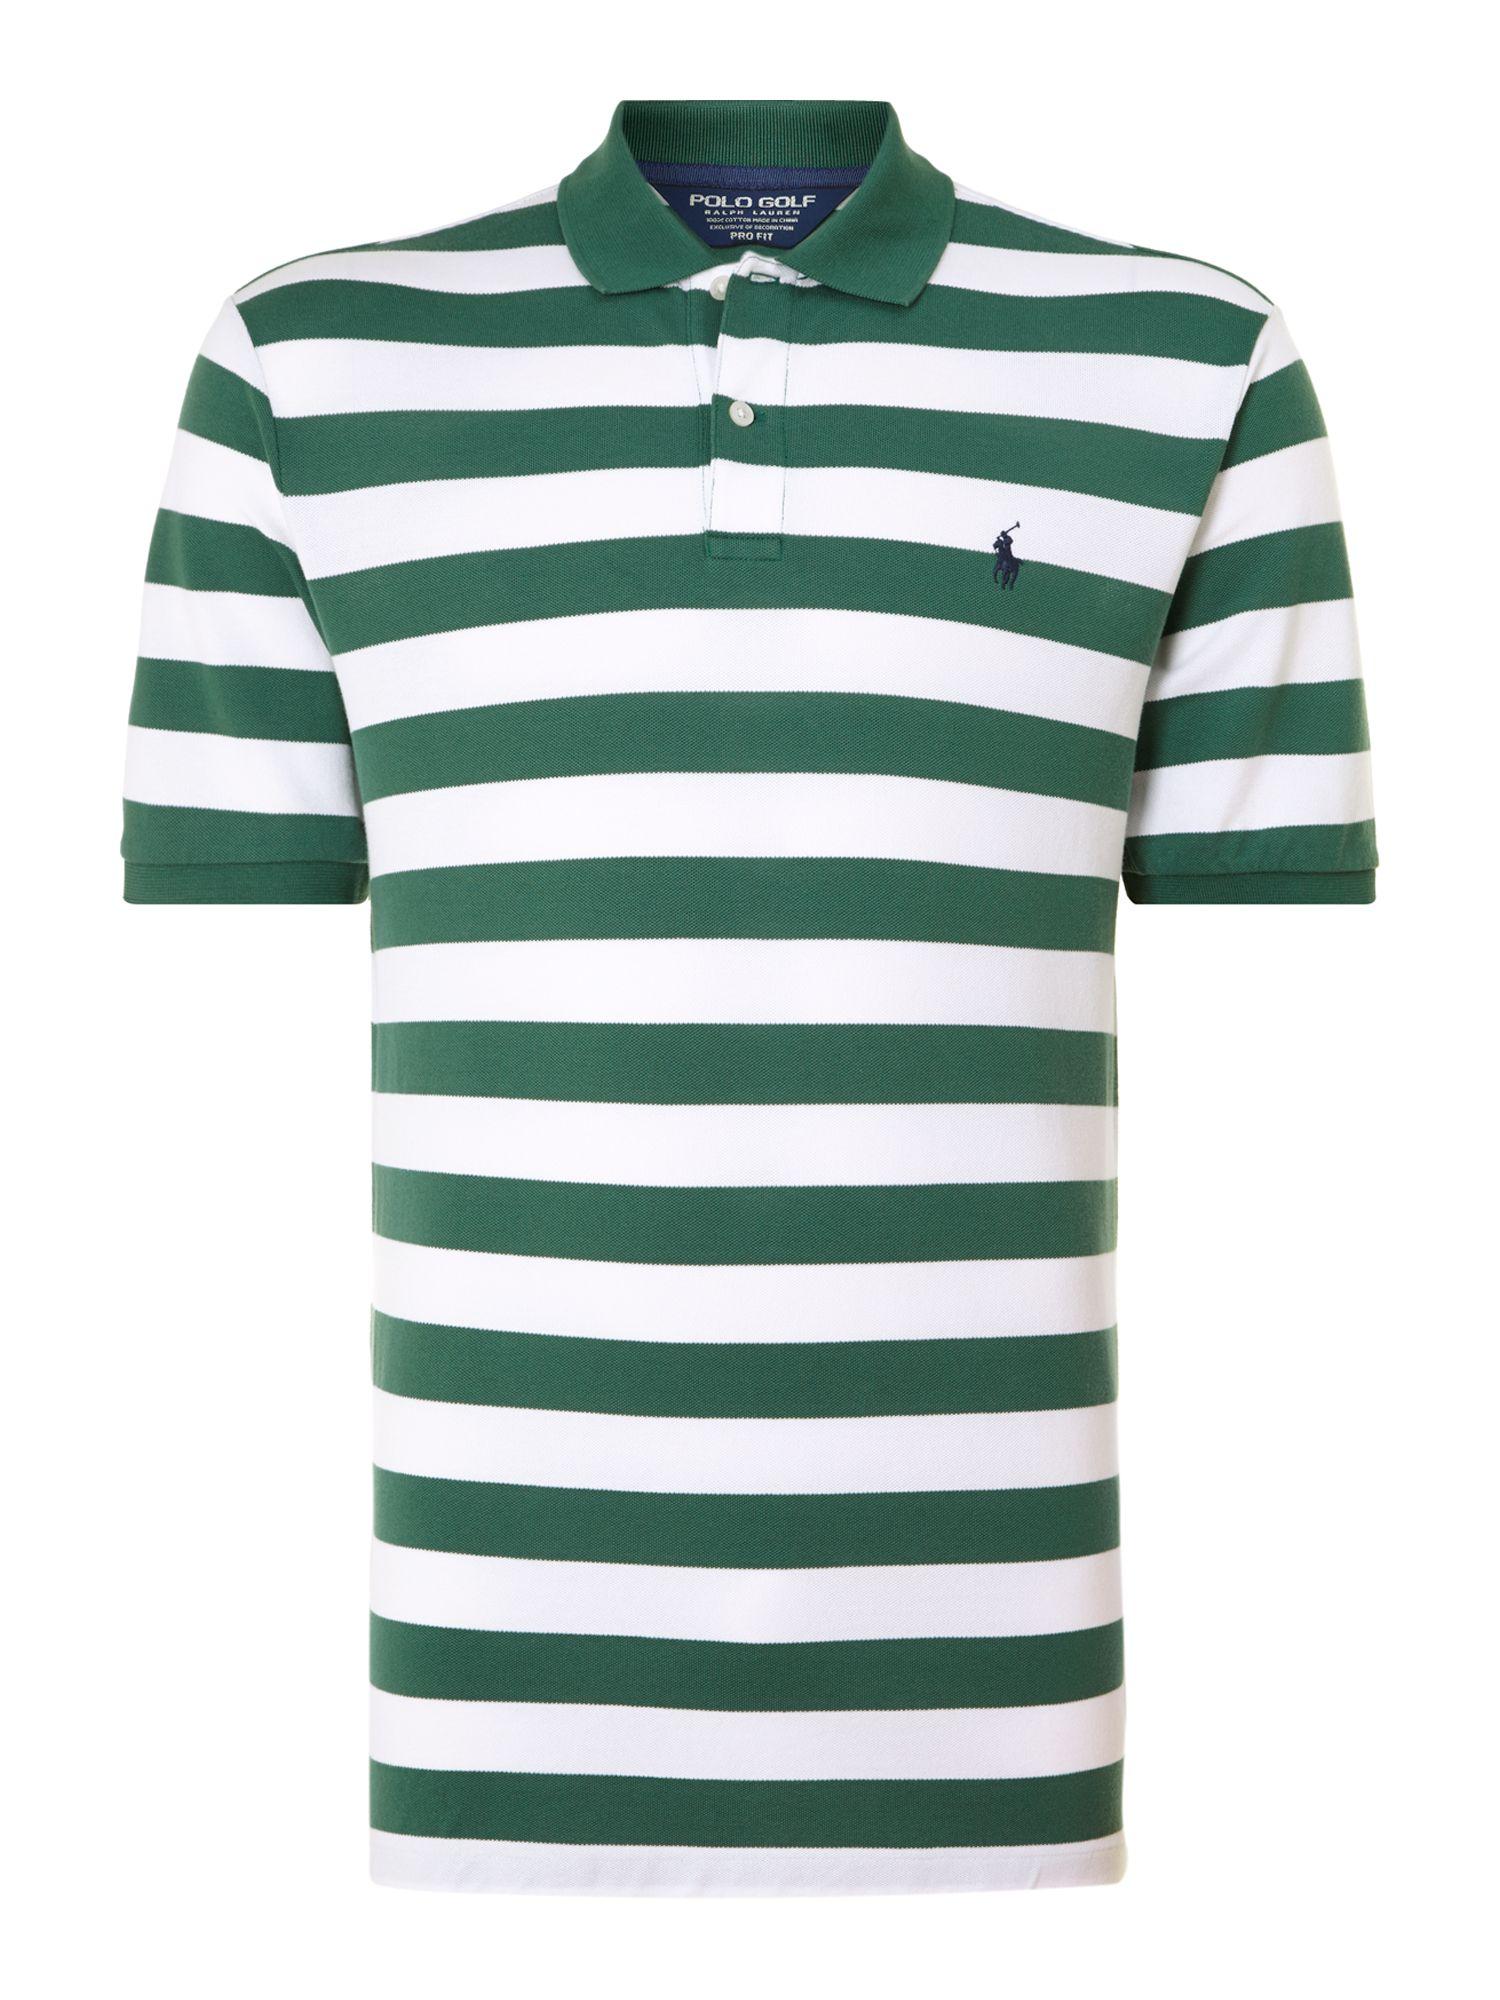 Ralph Lauren Golf Classic Block Striped Polo Shirt in ...